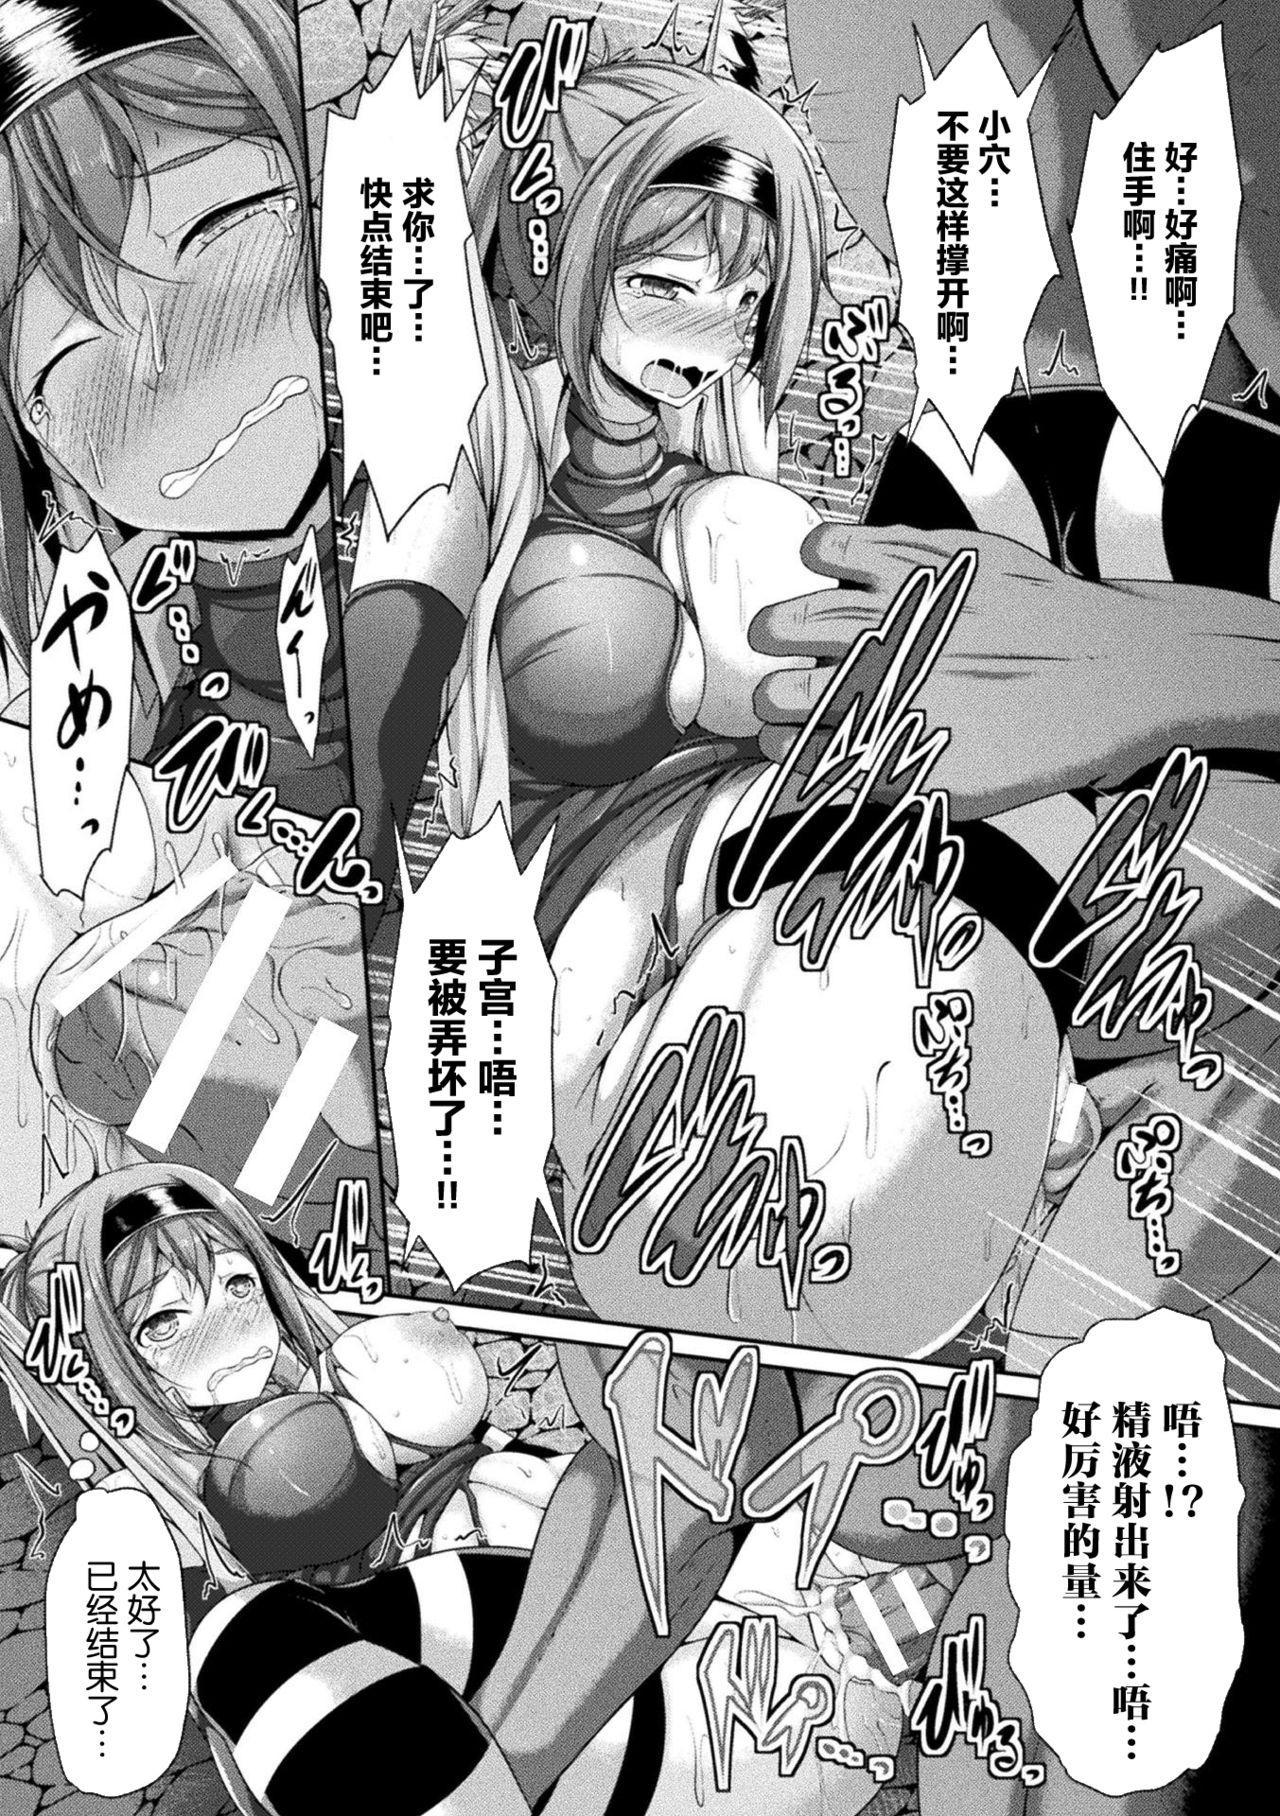 2D Comic Magazine Zecchou Kairaku ga Tomaranai Ero-Trap Dungeon Vol. 1 73